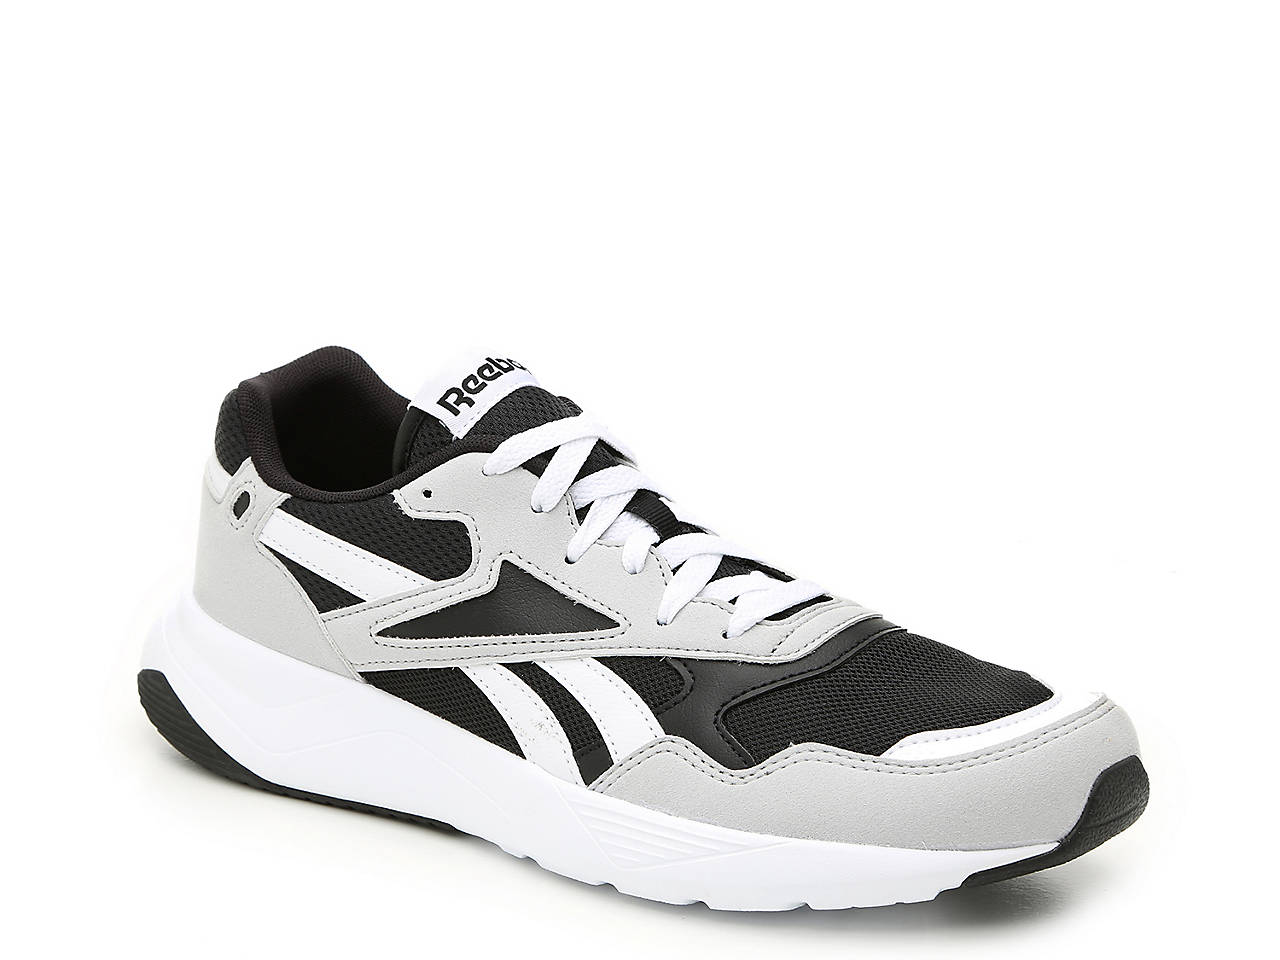 ba4b0ed261449 Reebok Classic Royal Dashonic Sneaker - Men s Men s Shoes